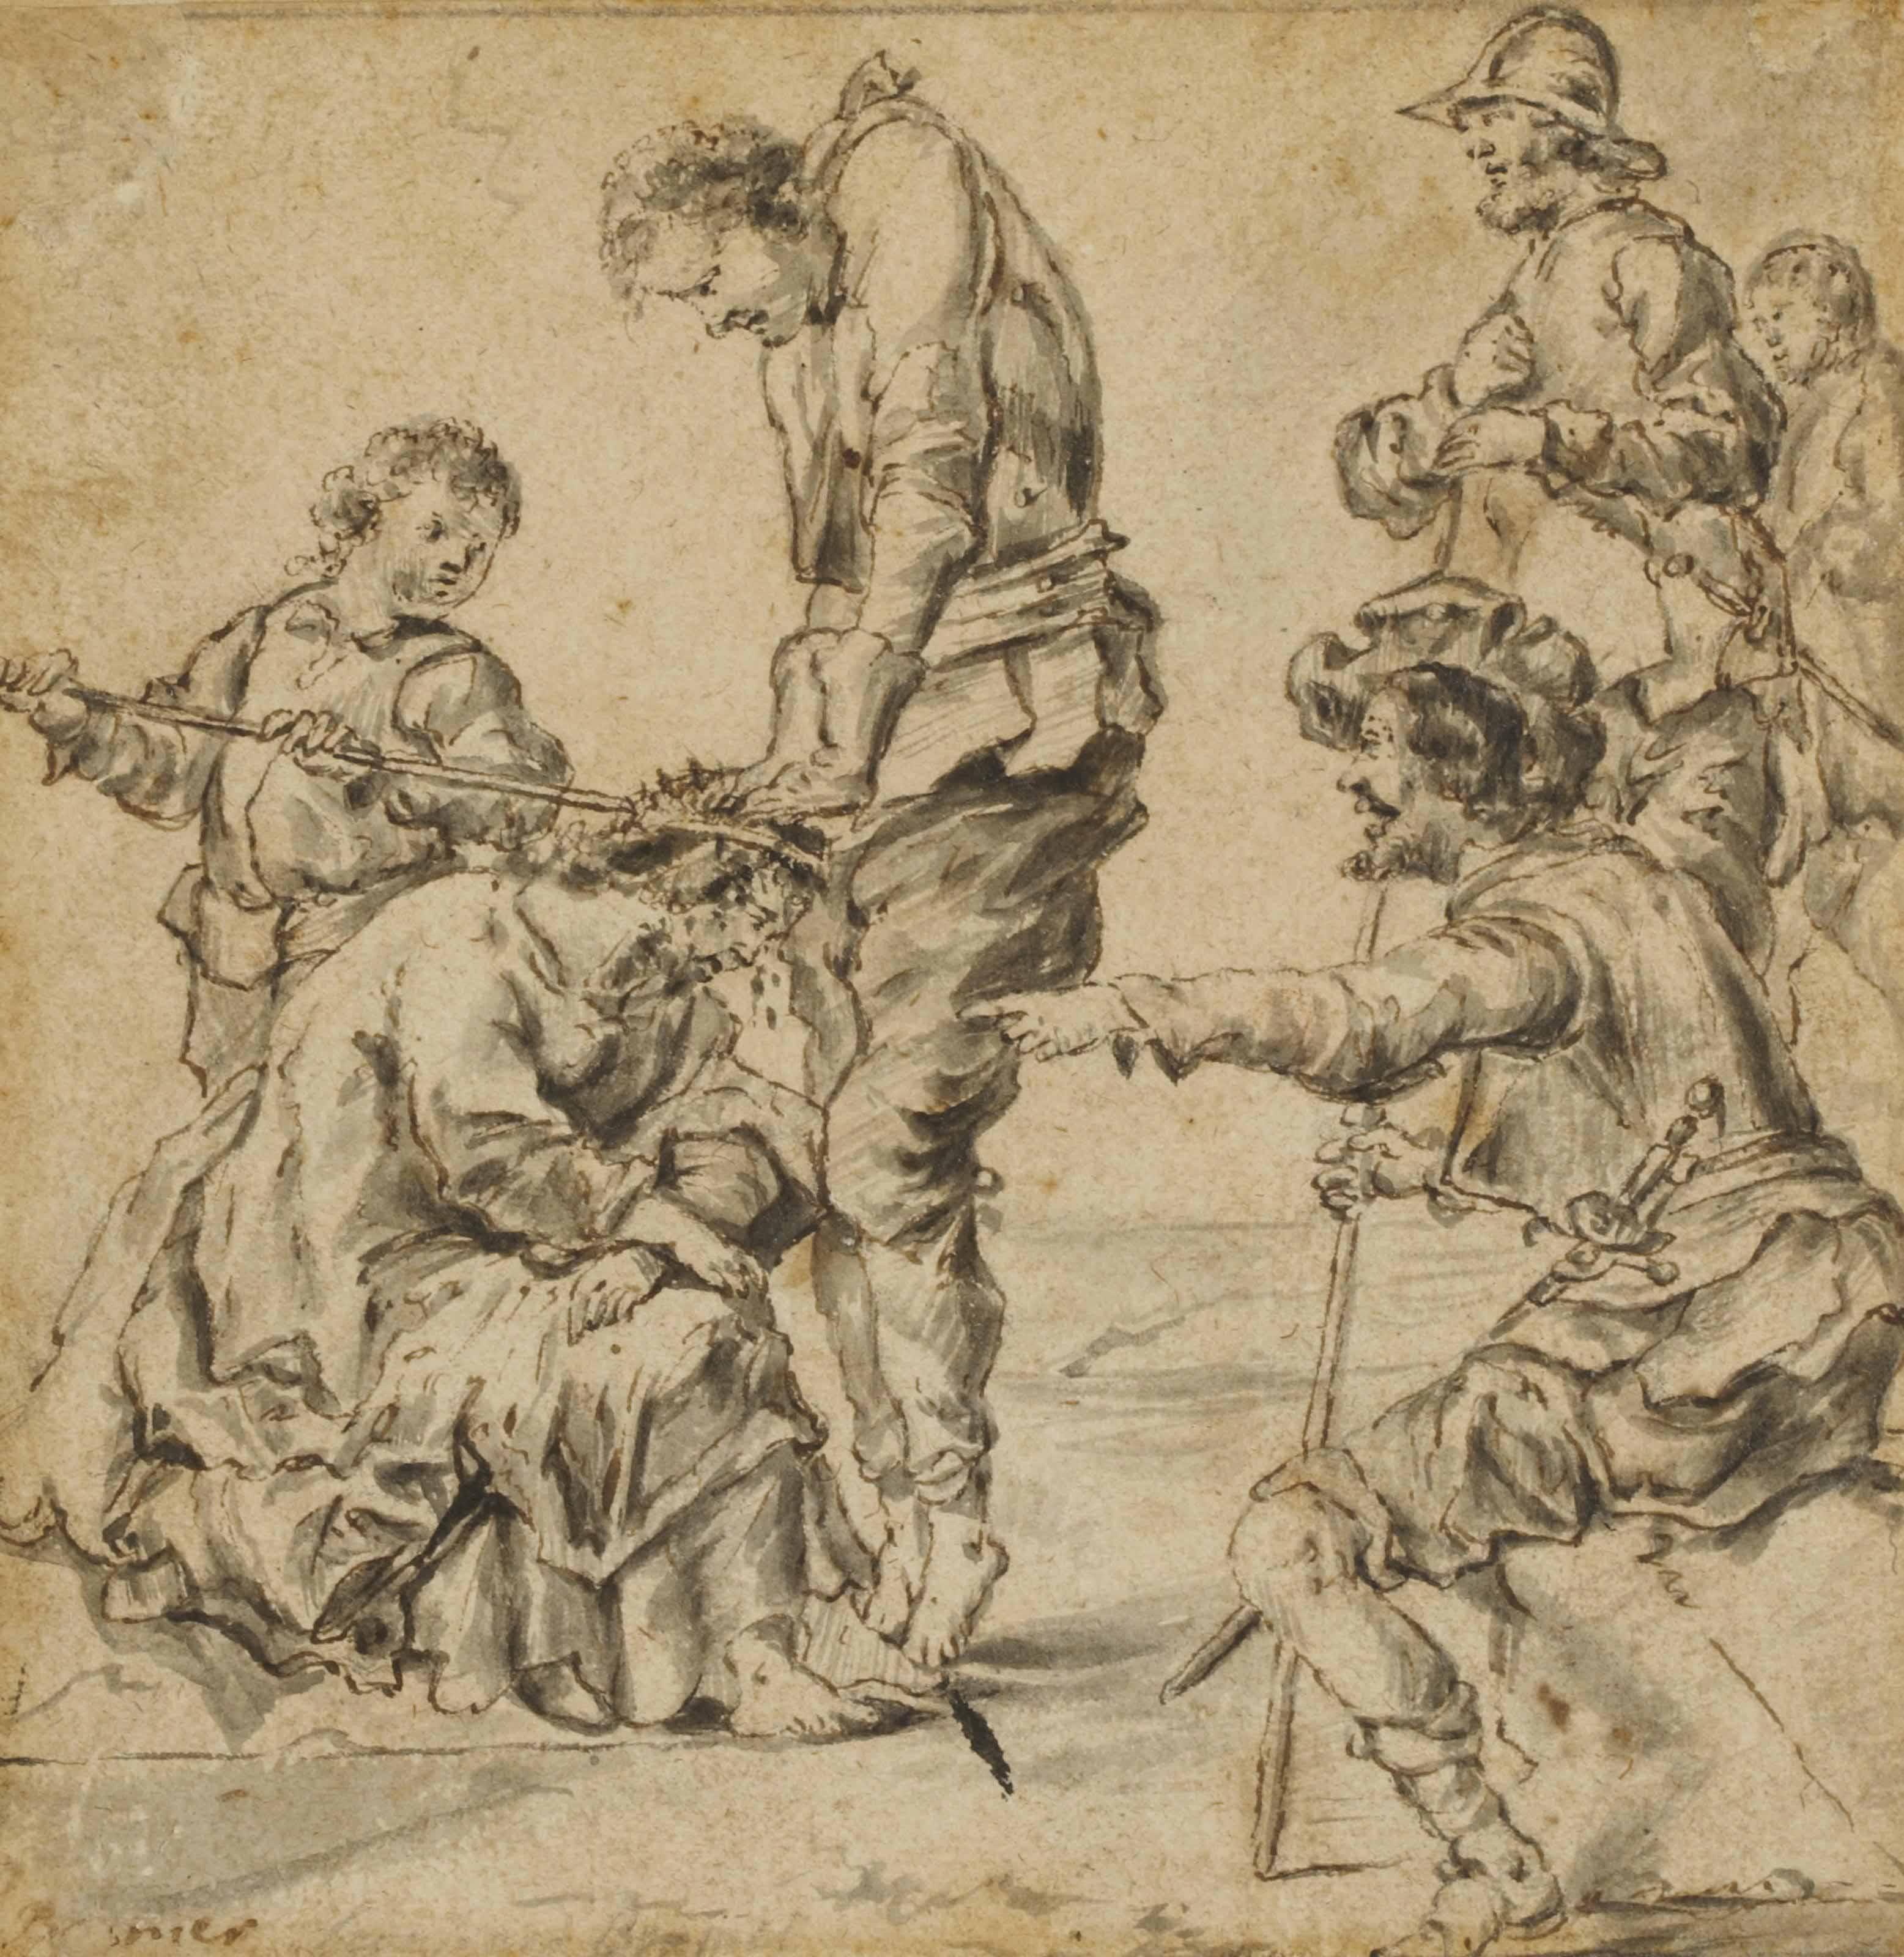 LEONAERT BRAMER (DELFT 1596-16